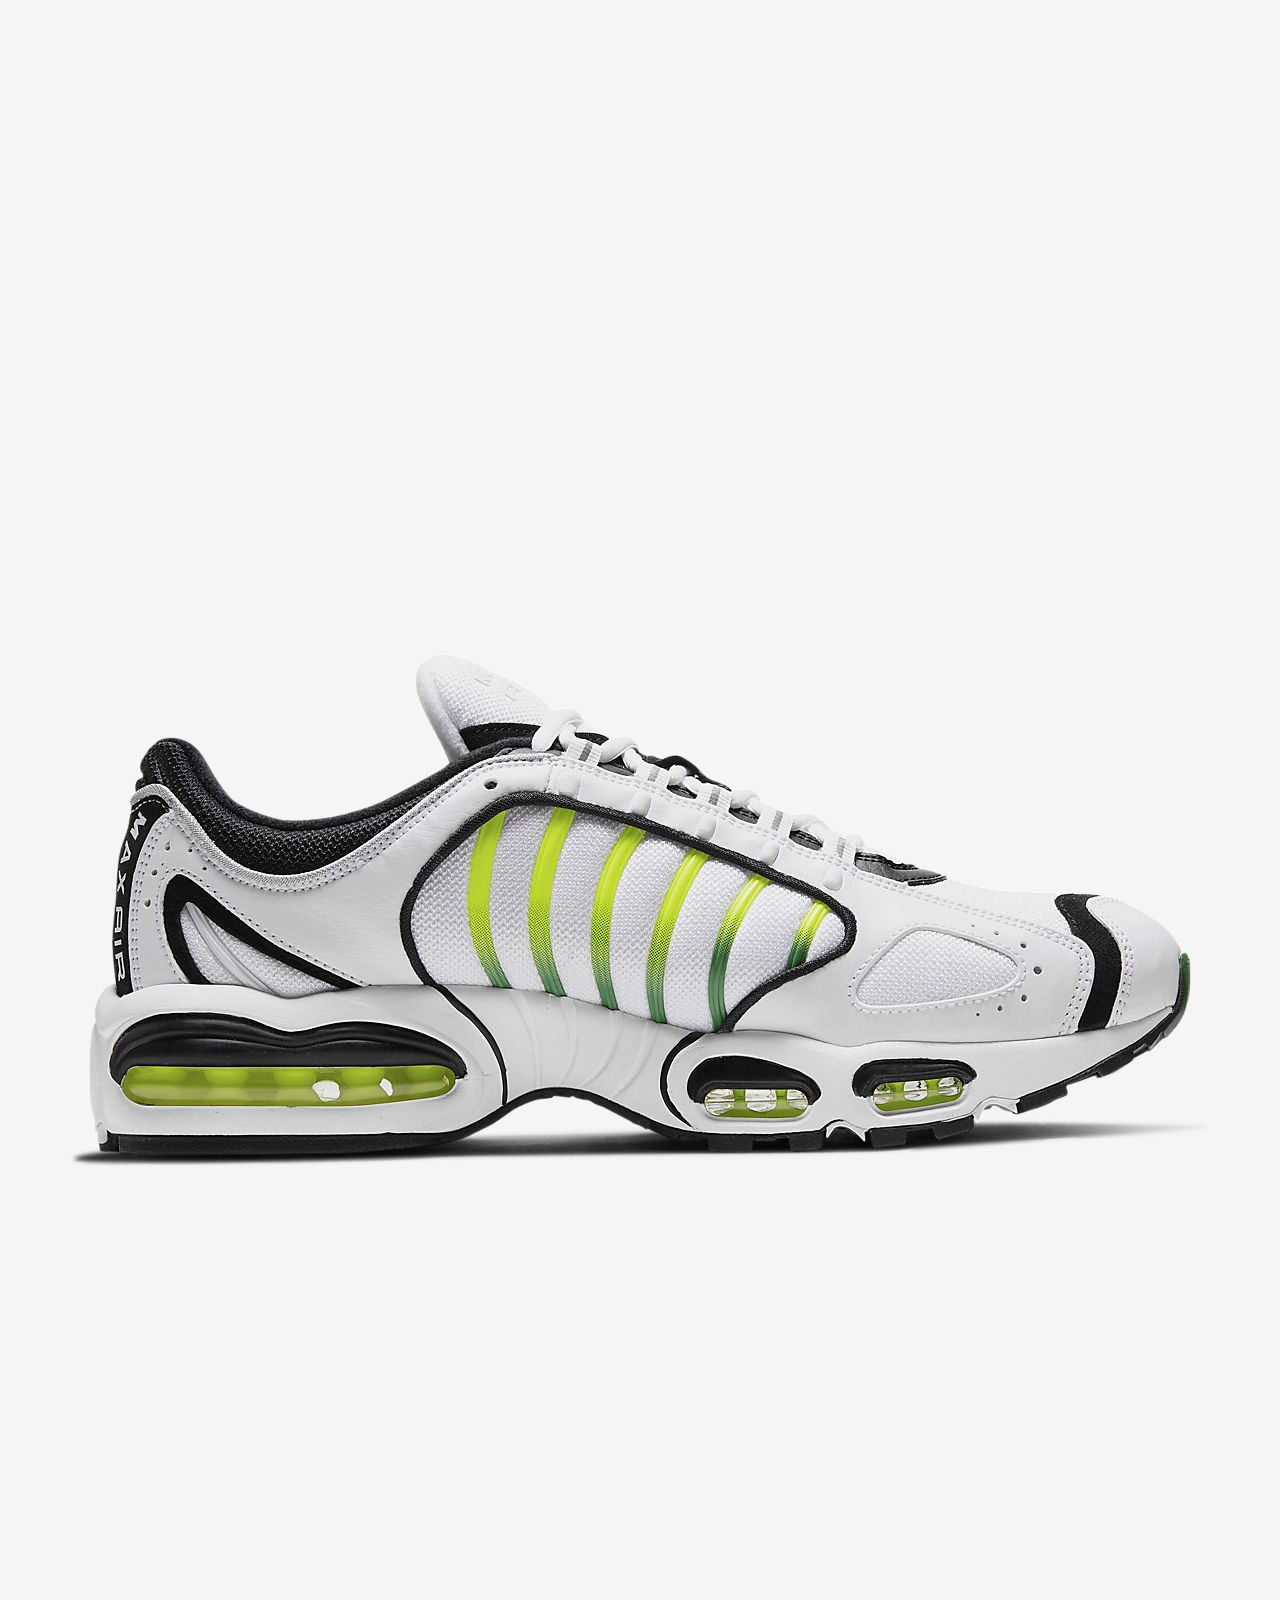 timeless design 602cc 0e852 ... Nike Air Max Tailwind IV Men s Shoe